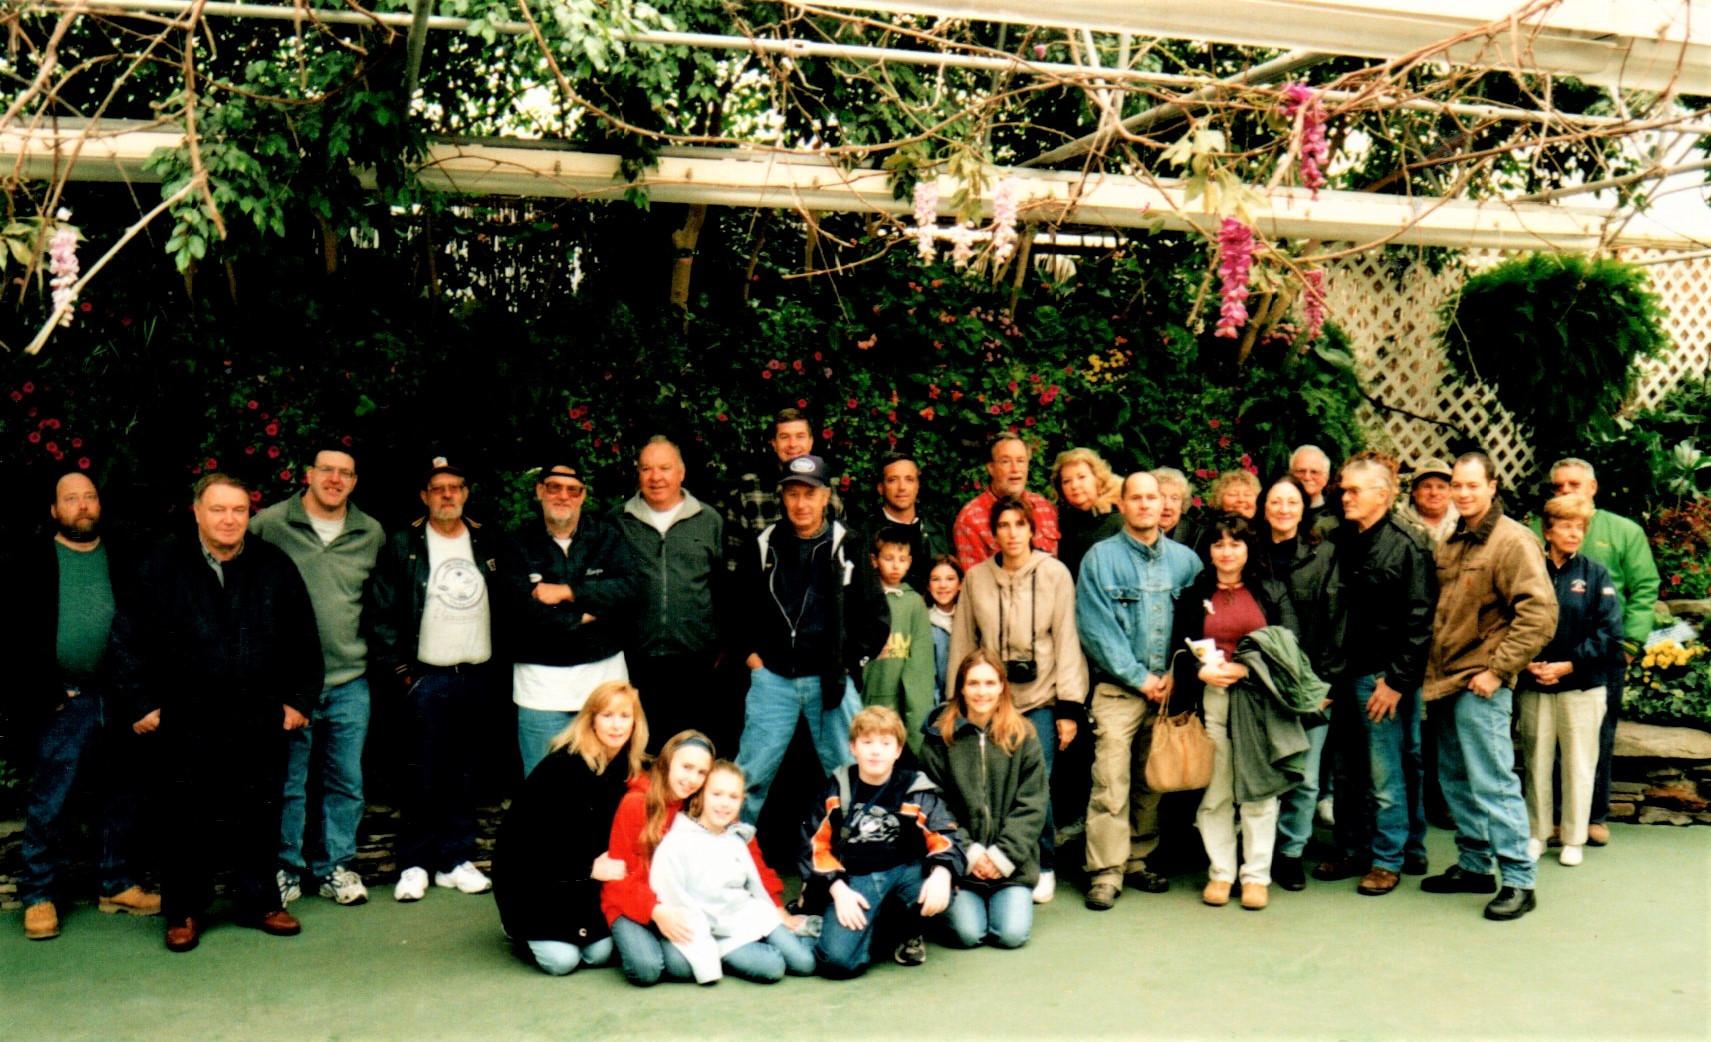 Members group photo